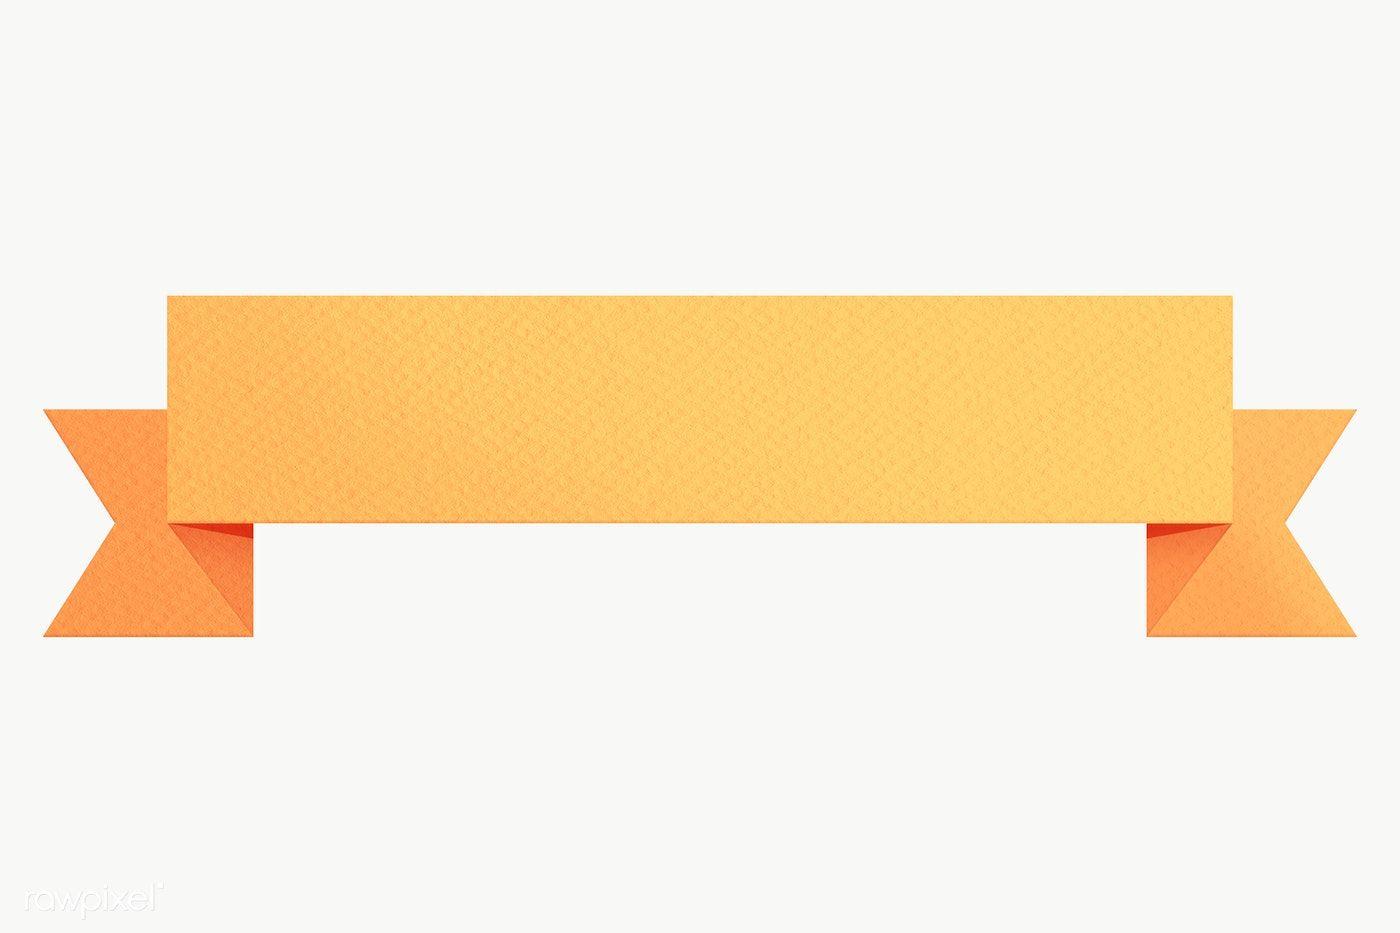 Marigold Yellow Ribbon Banner Design Element Free Image By Rawpixel Com Sasi Banner Design Ribbon Banner Creative Banners